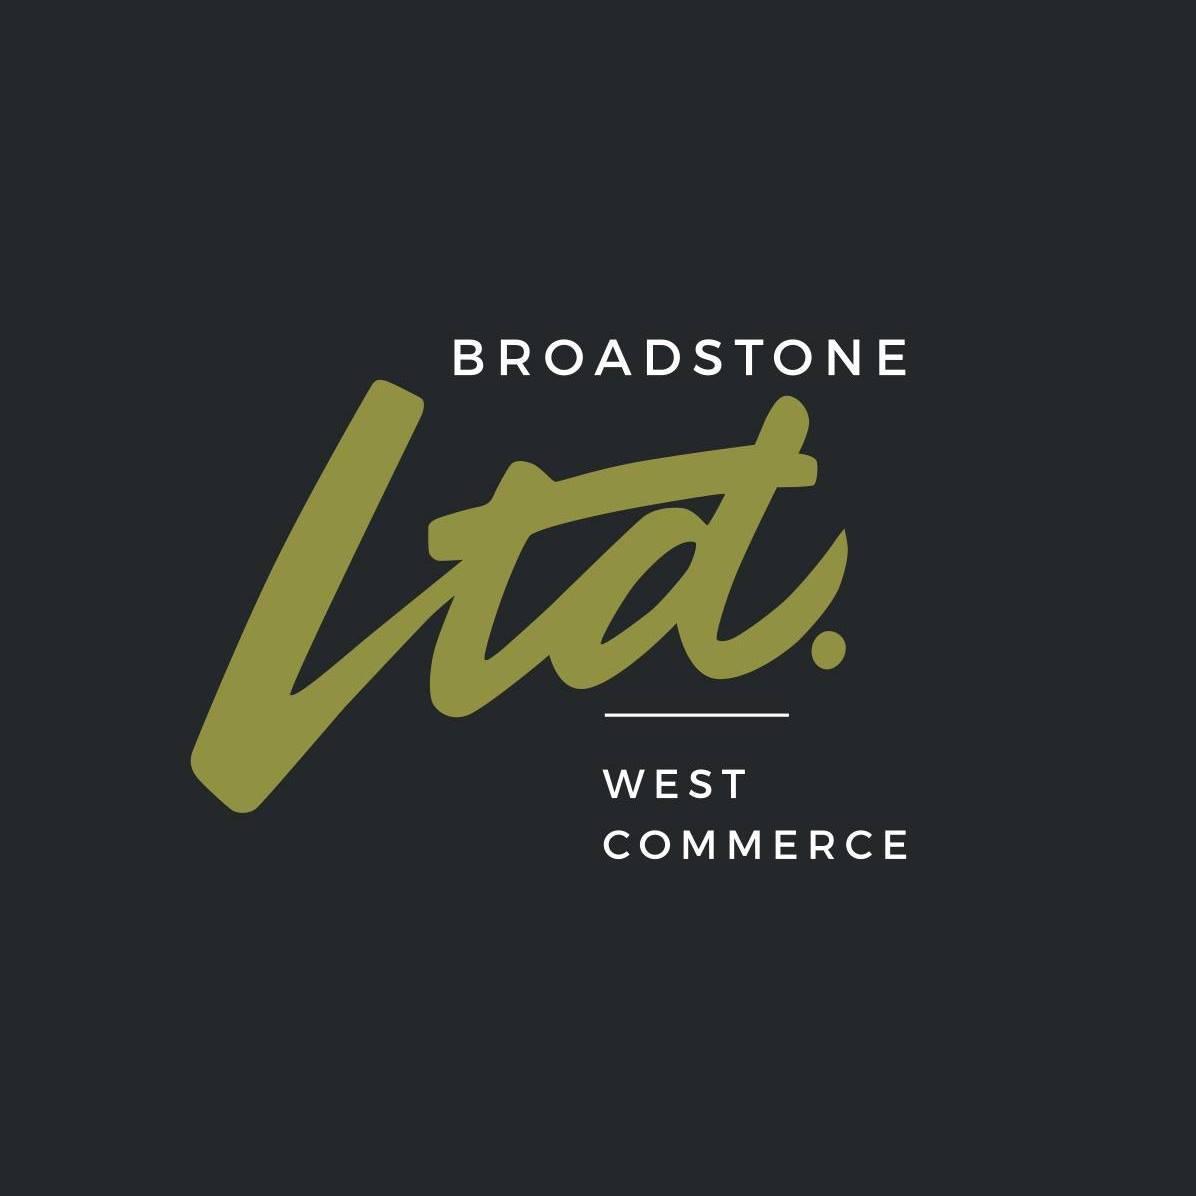 Broadstone LTD